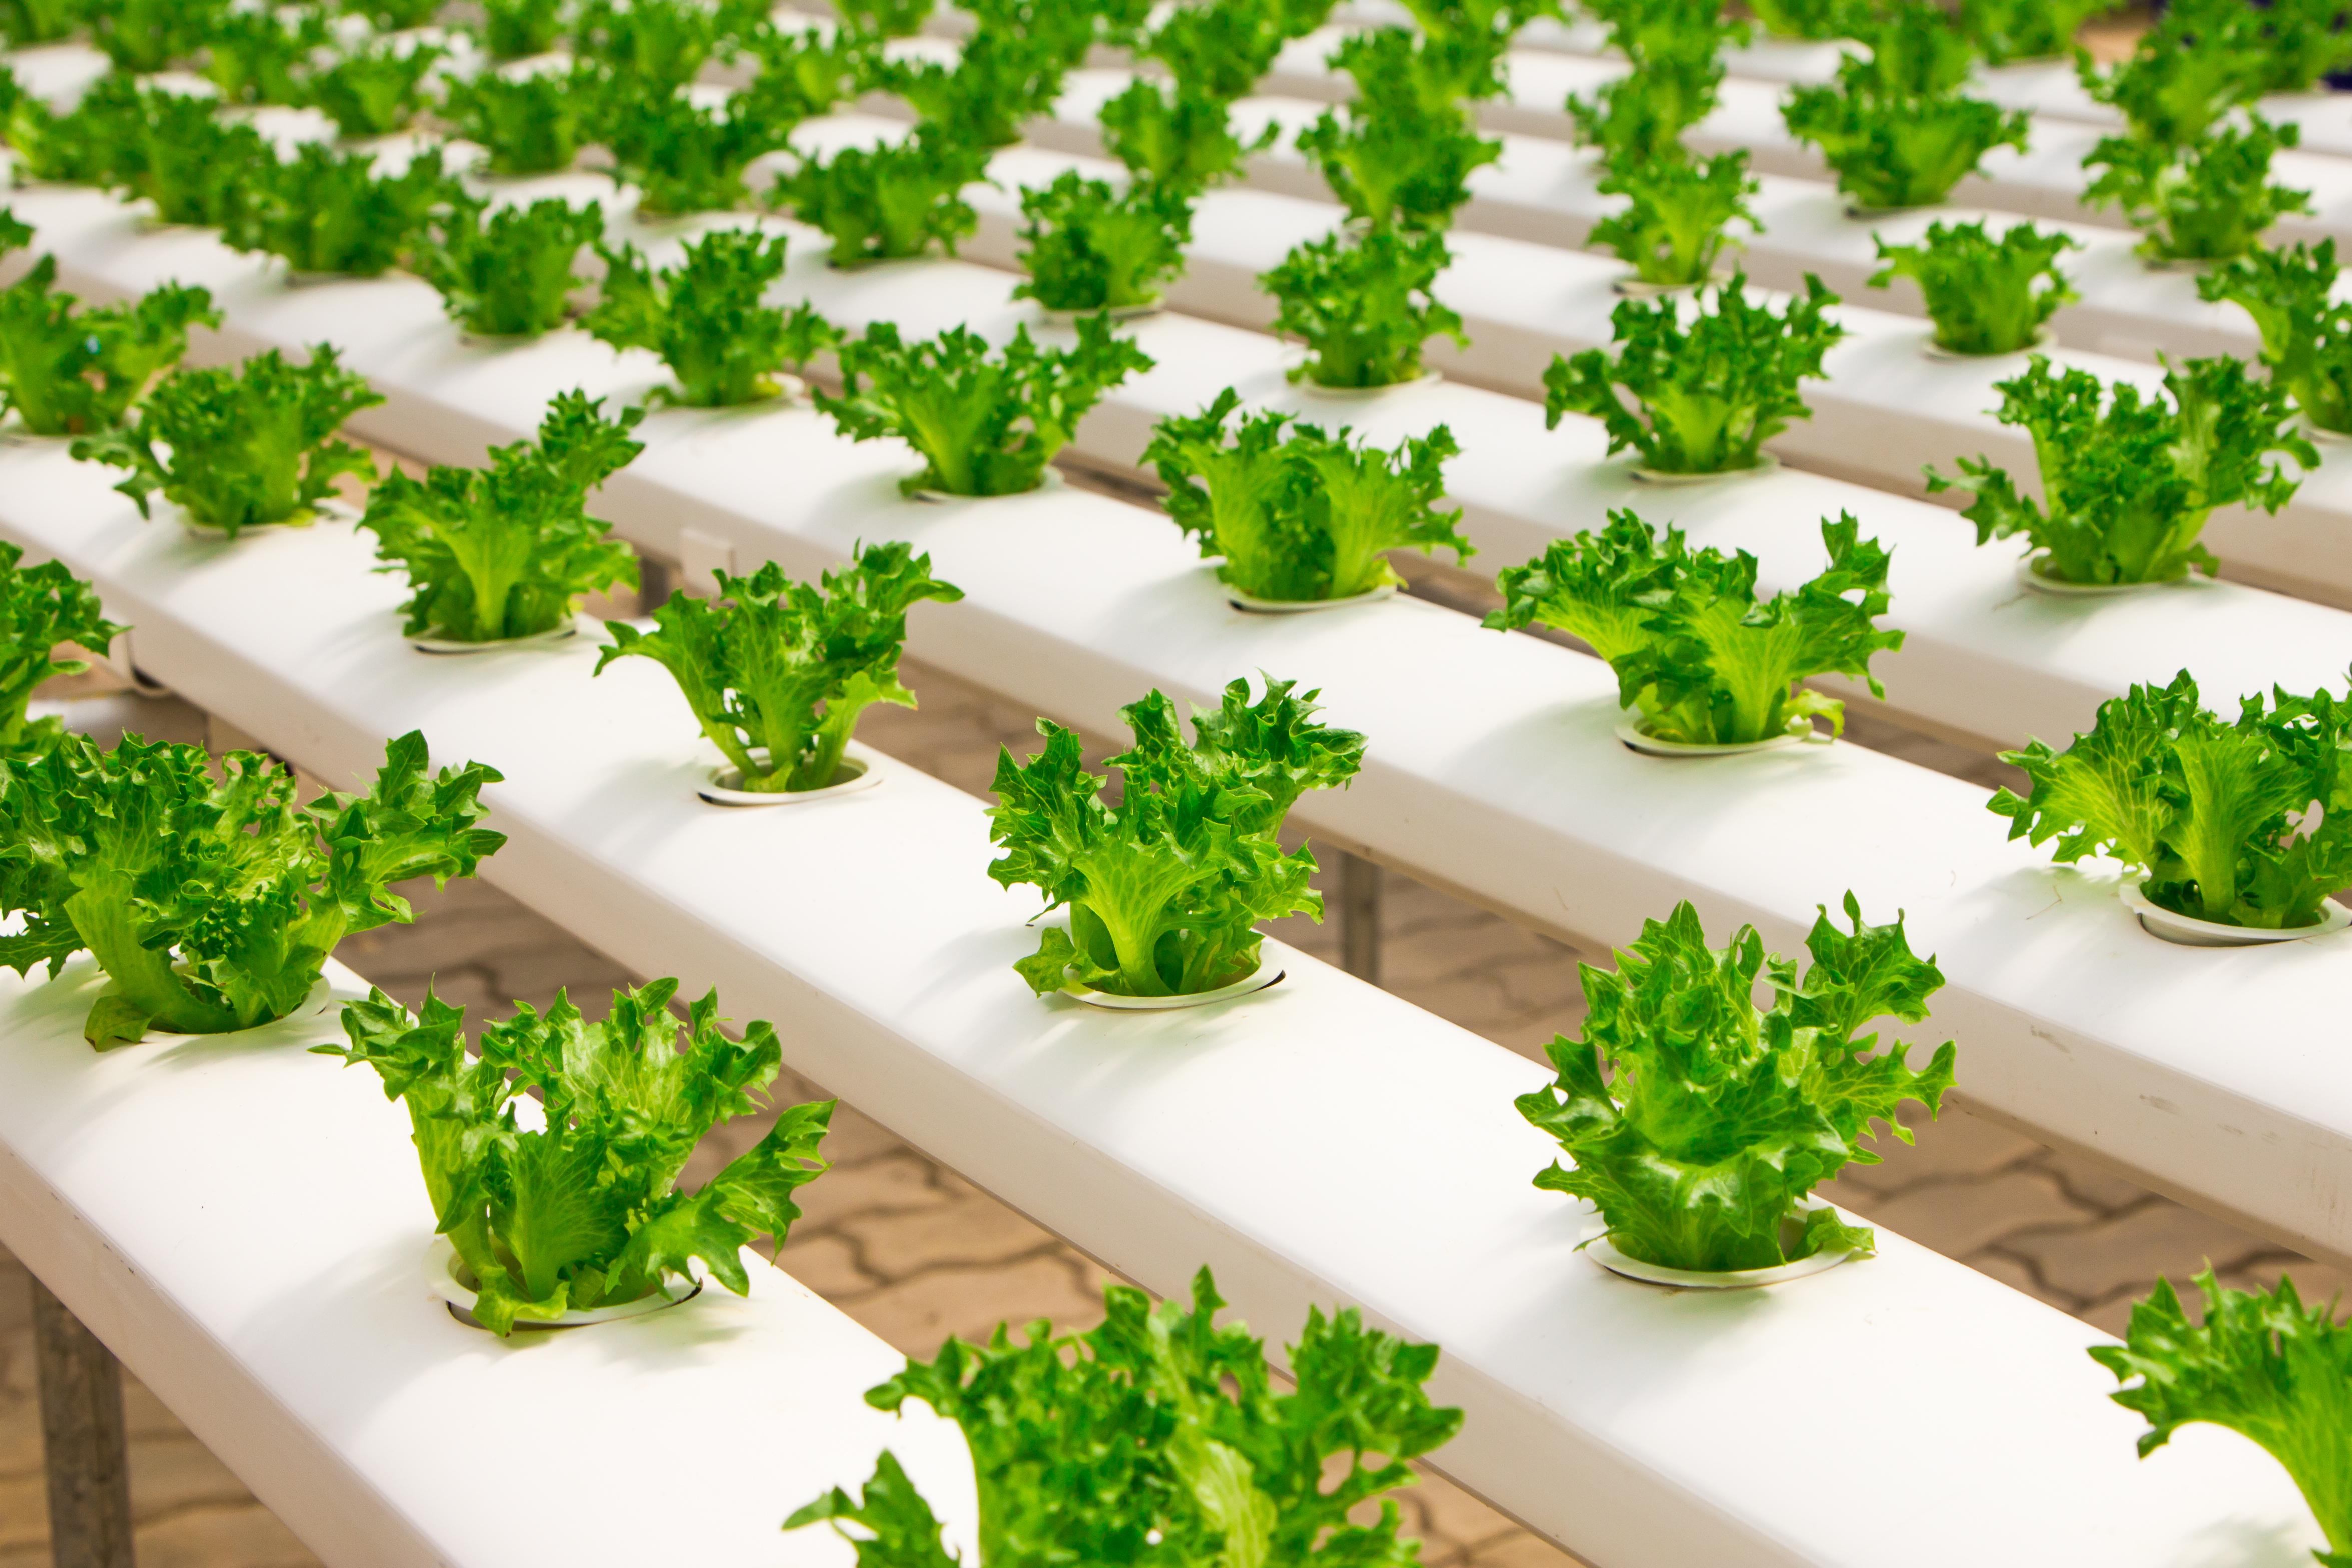 Growing Lettuce indoor urban farm